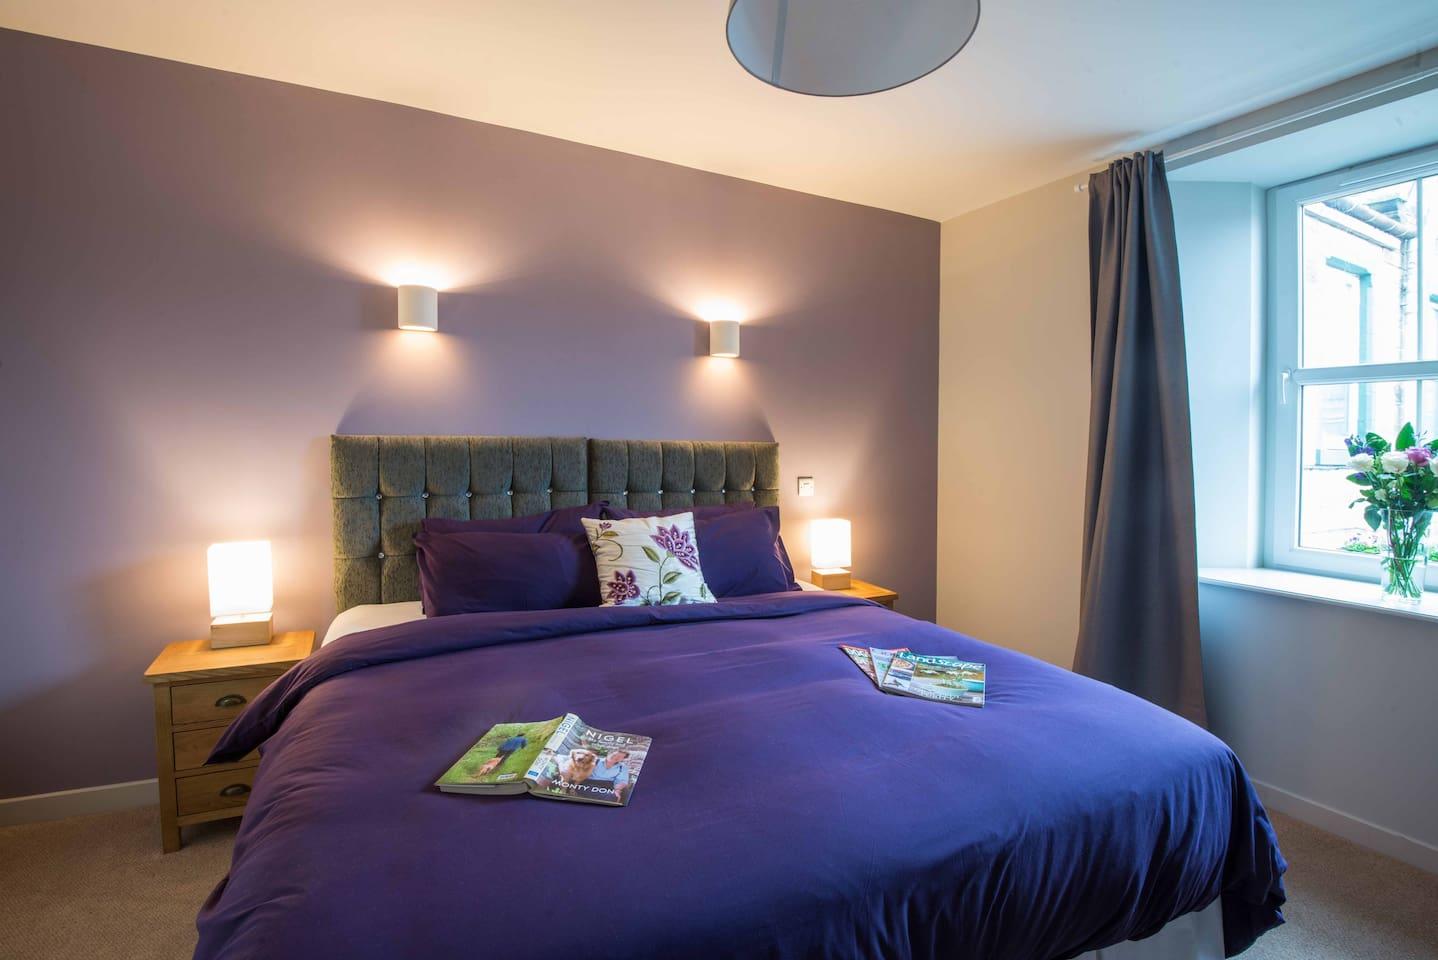 Superking bedroom, ensuite